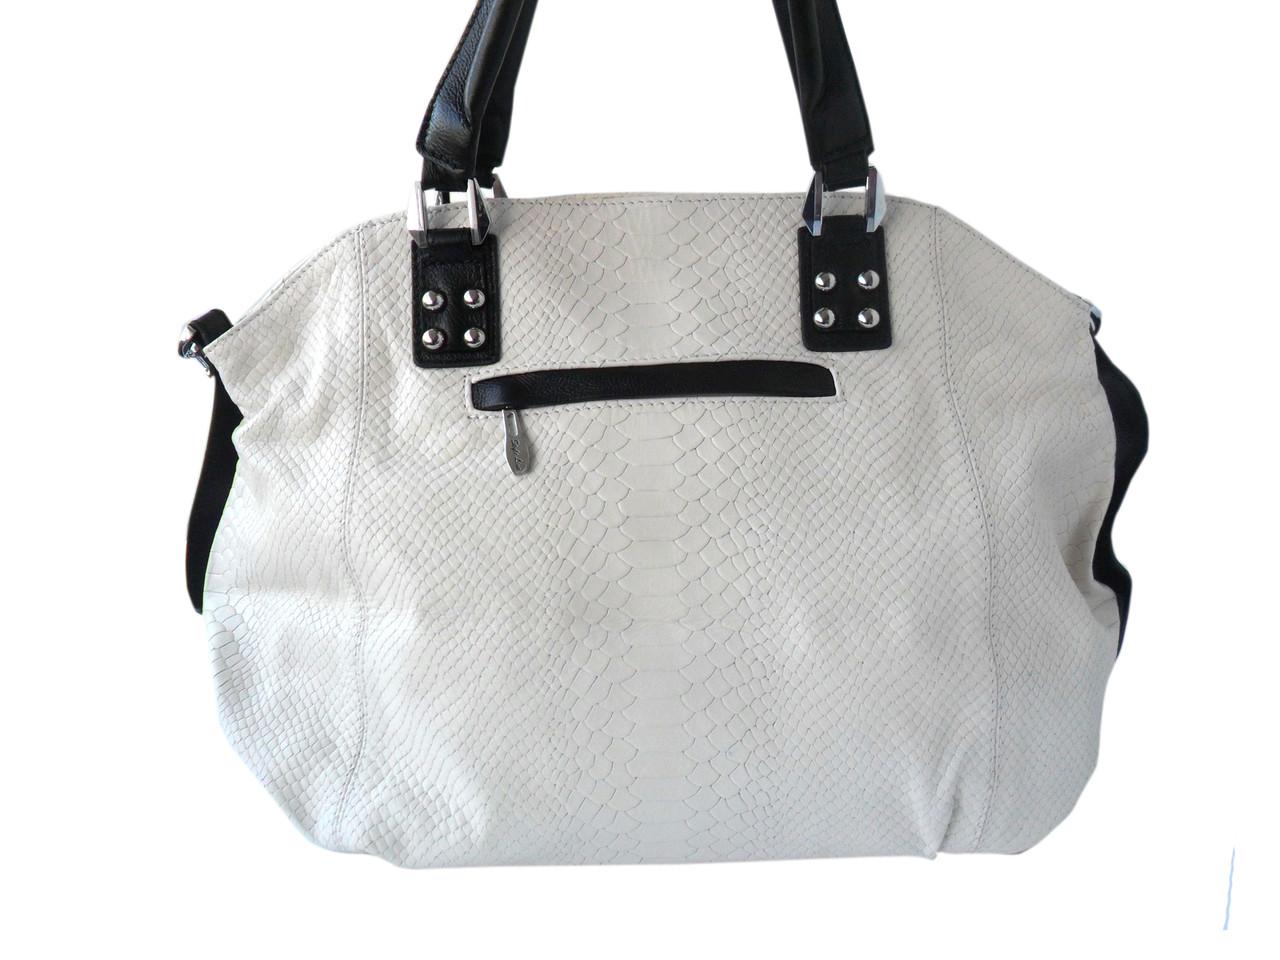 79b08a946e83 Летняя молочная сумка из итальянской кожи: продажа, цена в Харькове ...